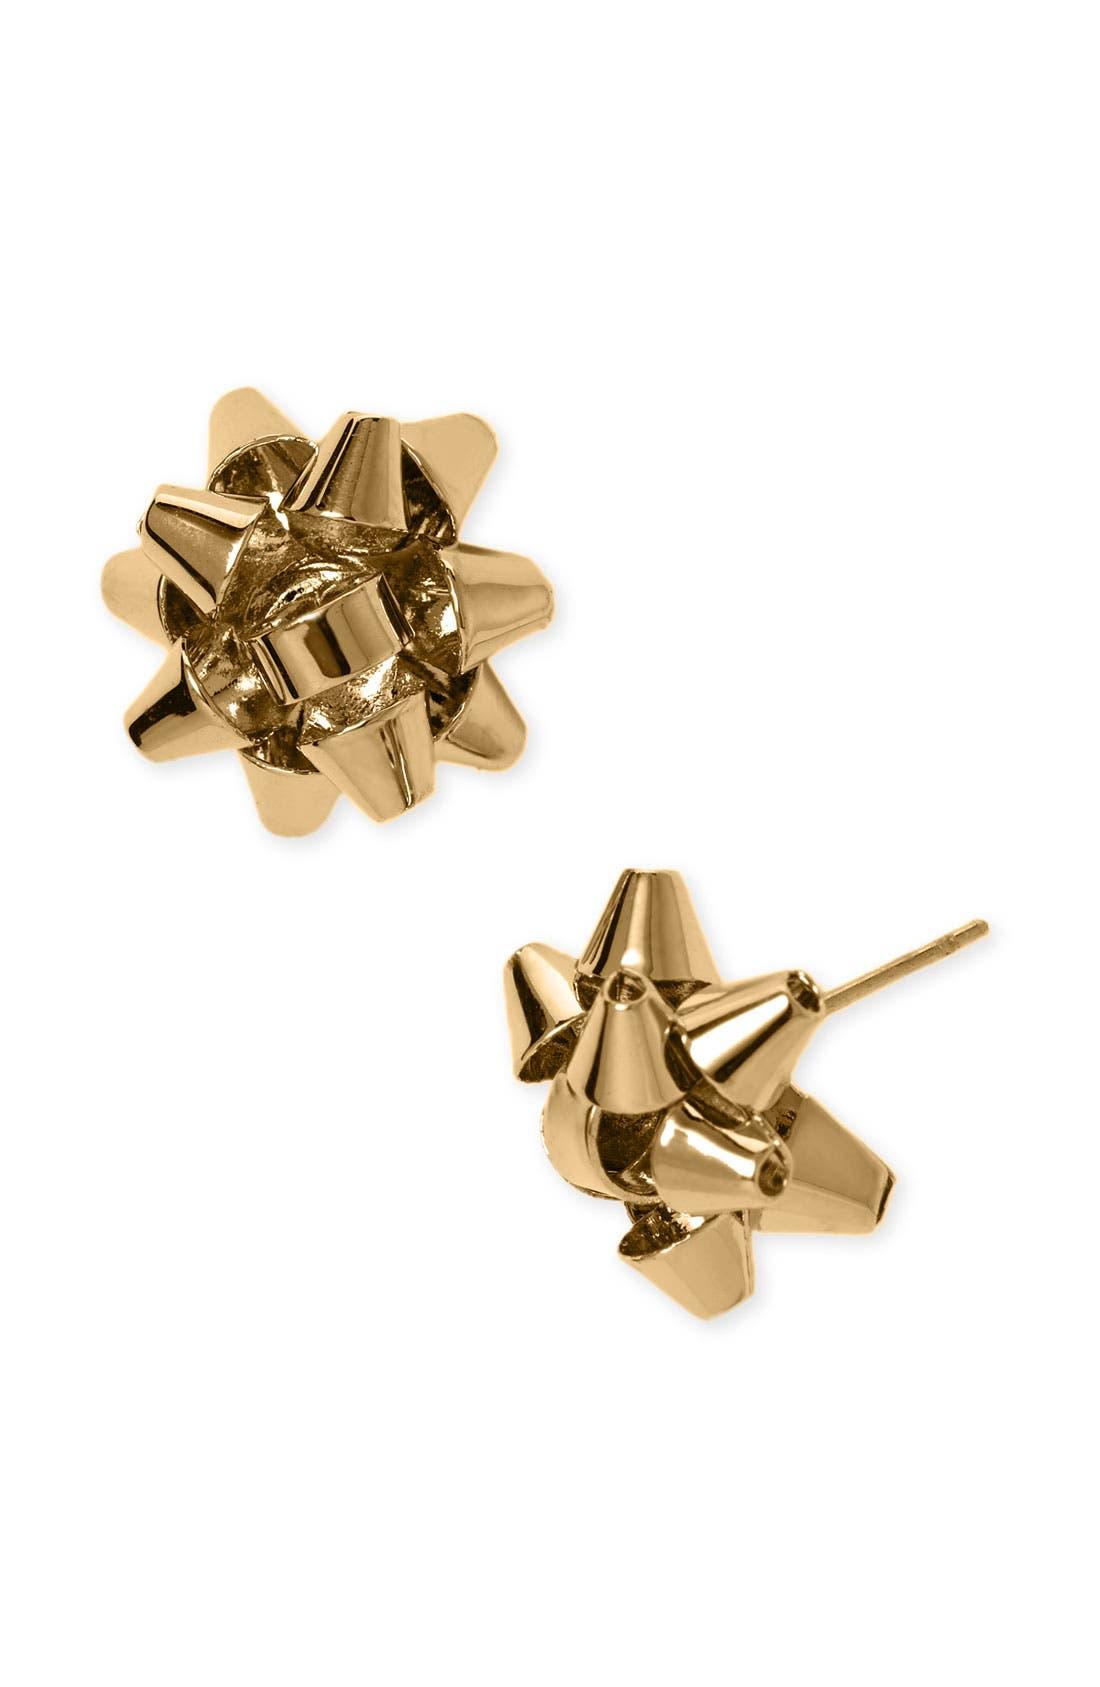 Main Image - kate spade 'bourgeois bow' stud earrings